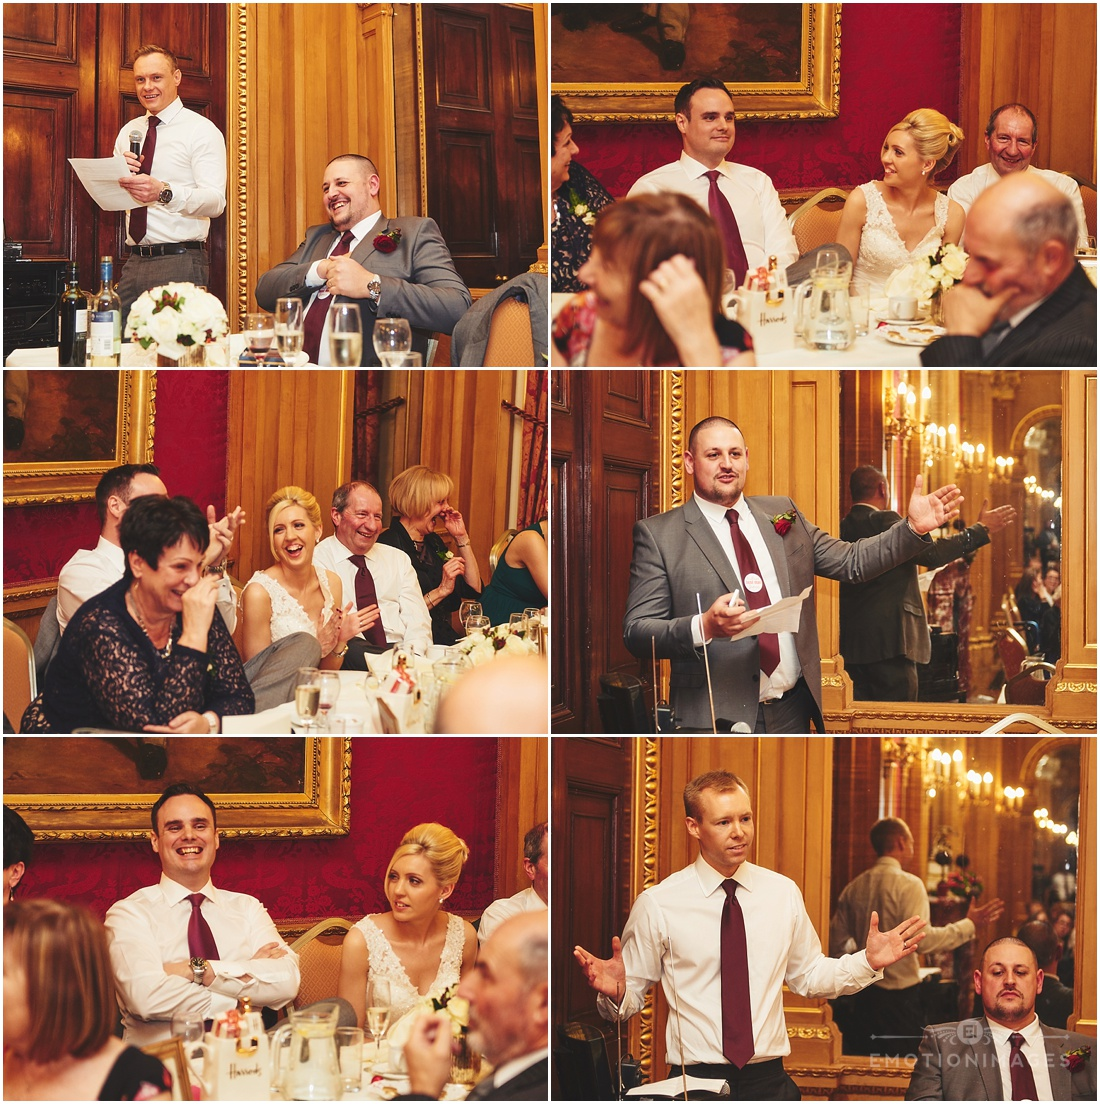 Hylands_House_wedding_photography_e-motion_images_014.JPG